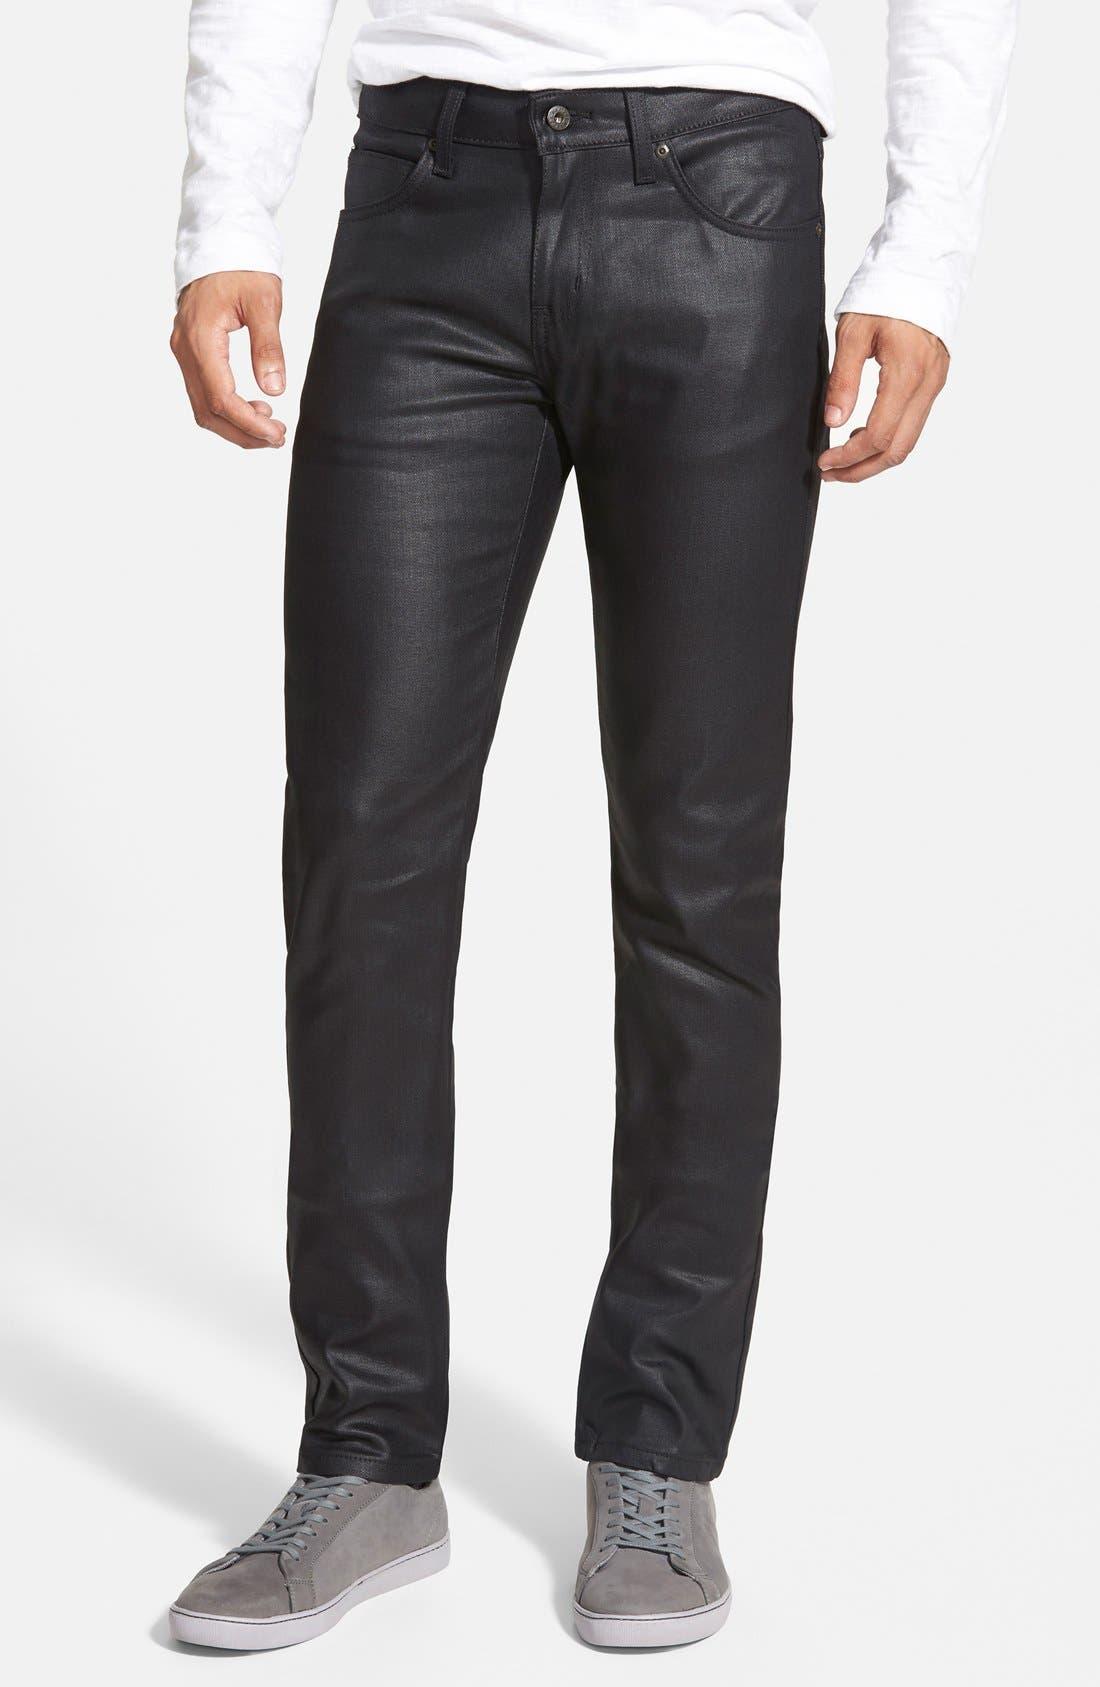 Naked & Famous Denim Super Skinny Guy Skinny Stretch Jeans (Black)